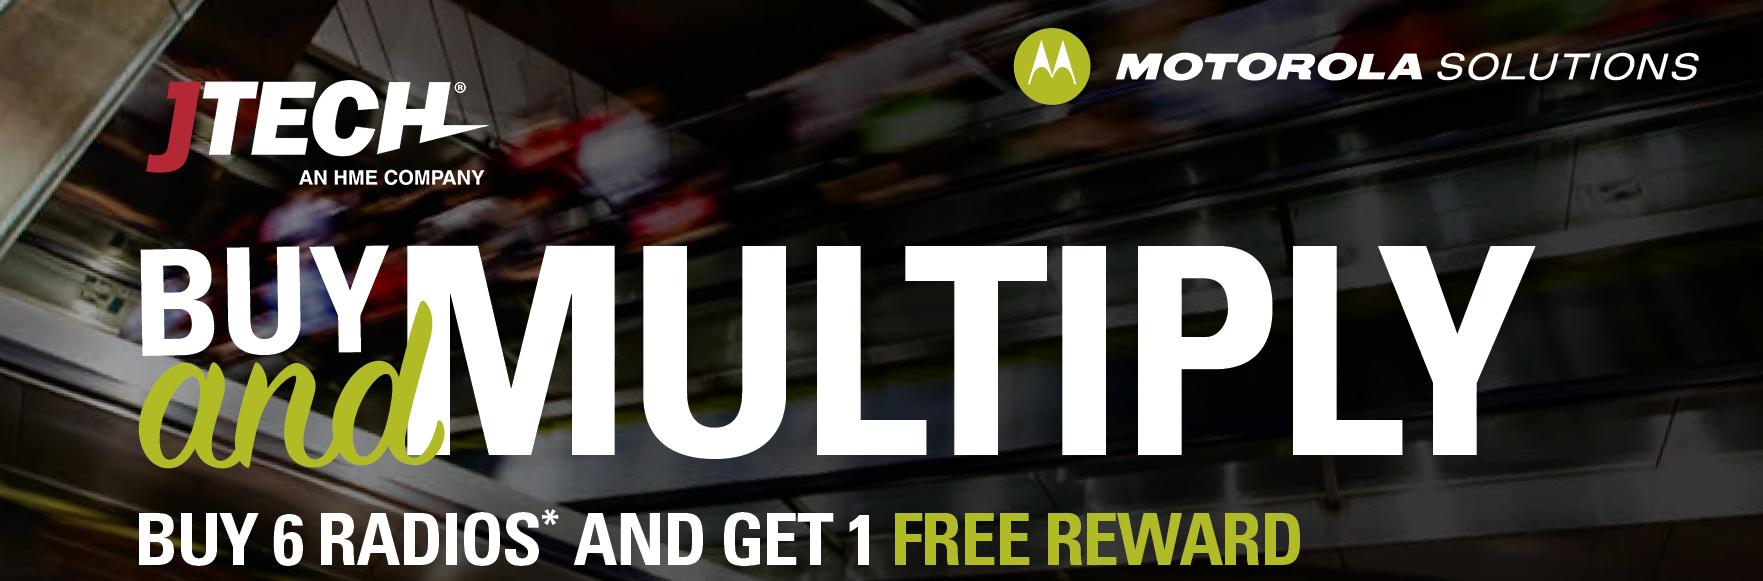 buy-multiply-jtech